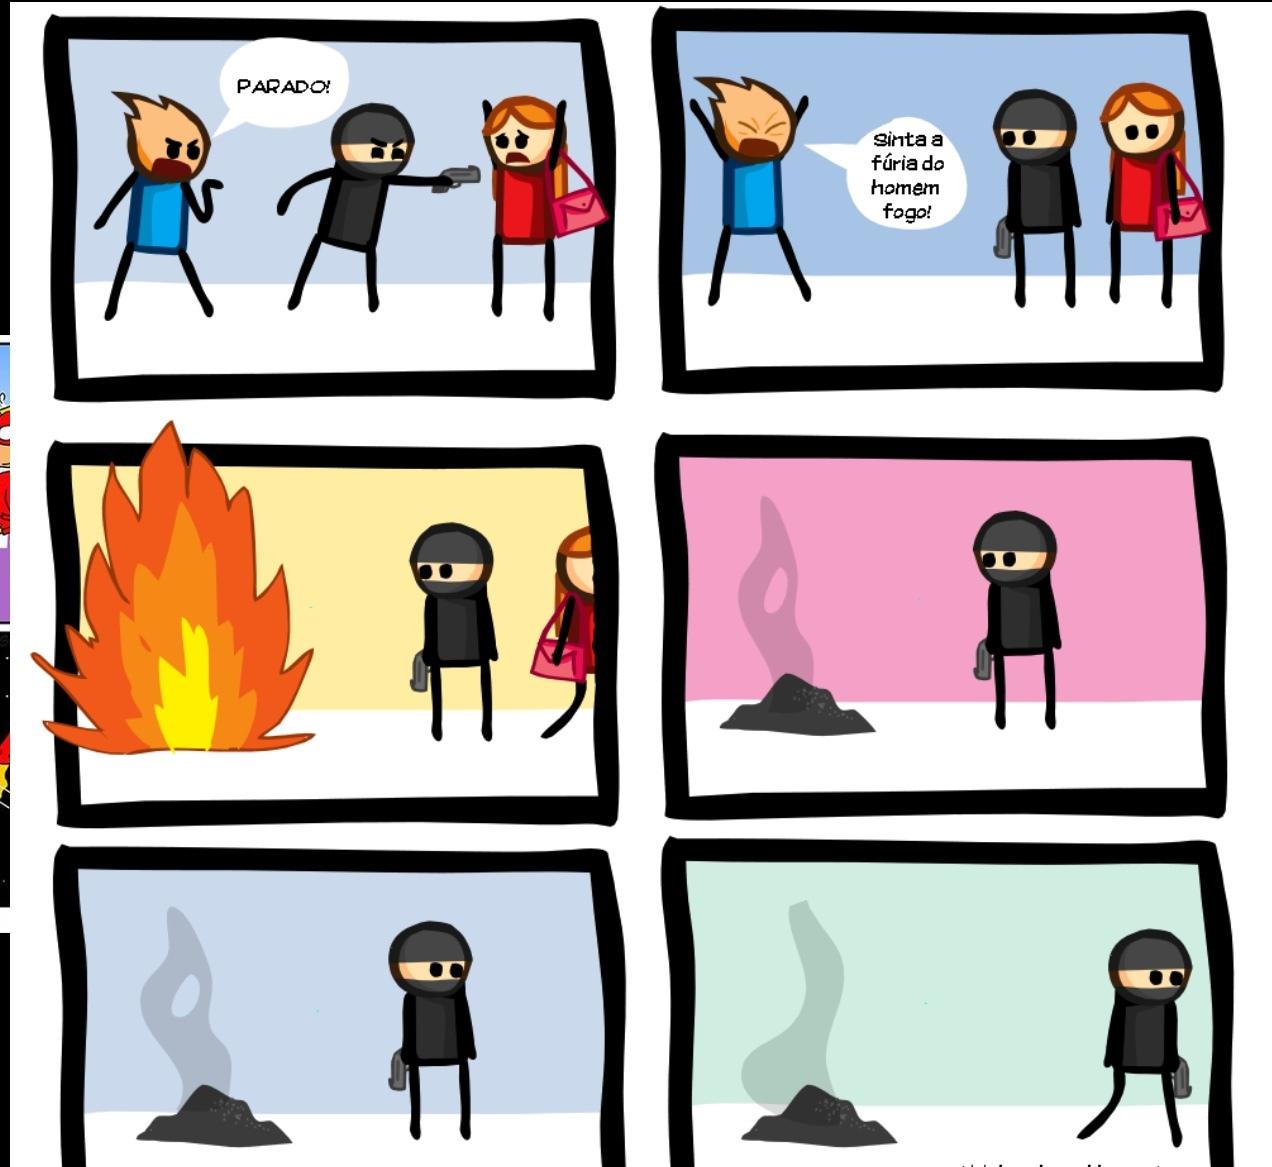 esta pegando fogo bicho - meme